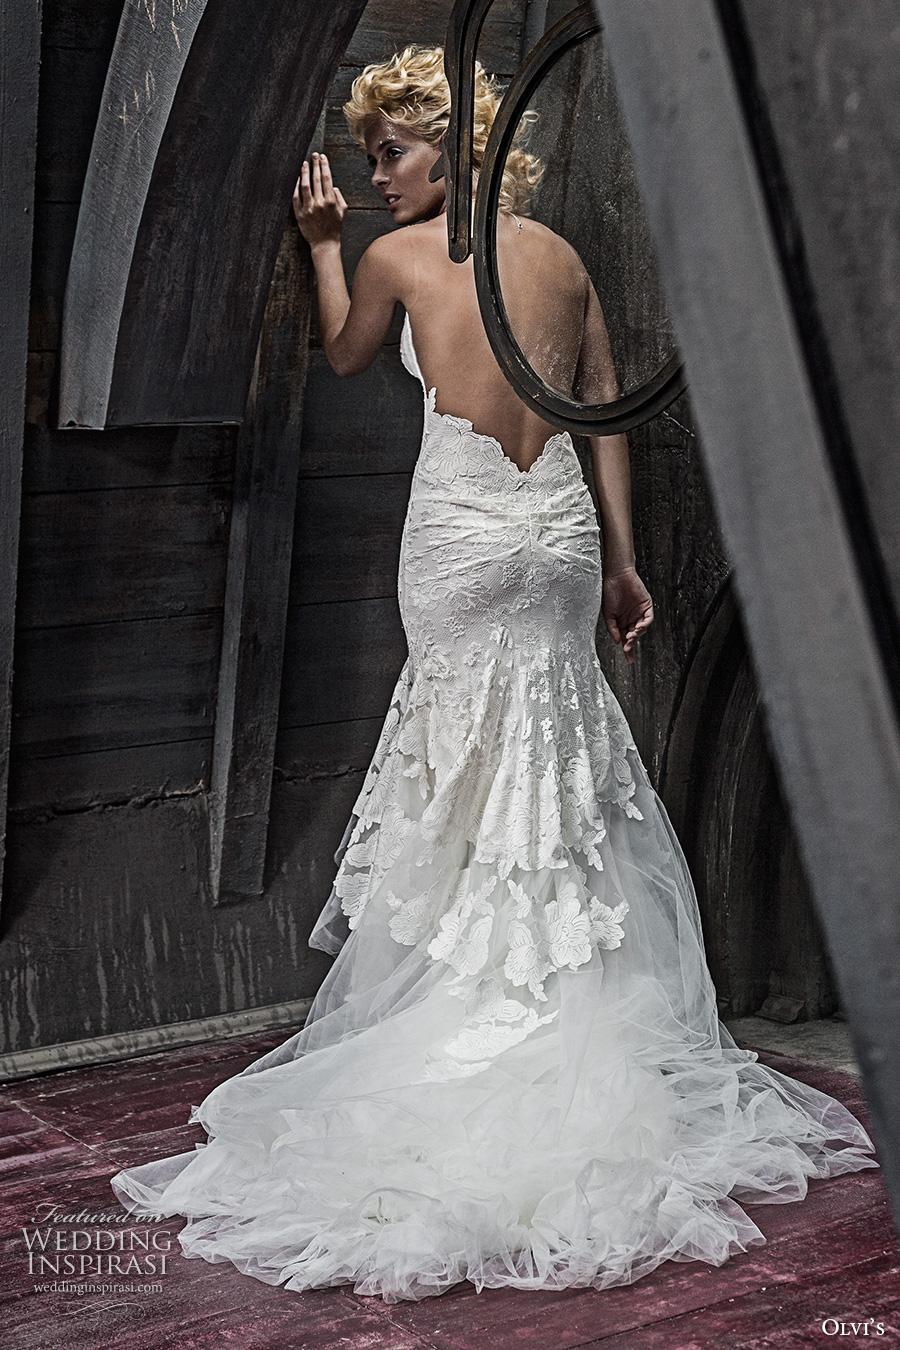 Olga yermoloff 2017 couture wedding dresses wedding for High couture wedding dresses